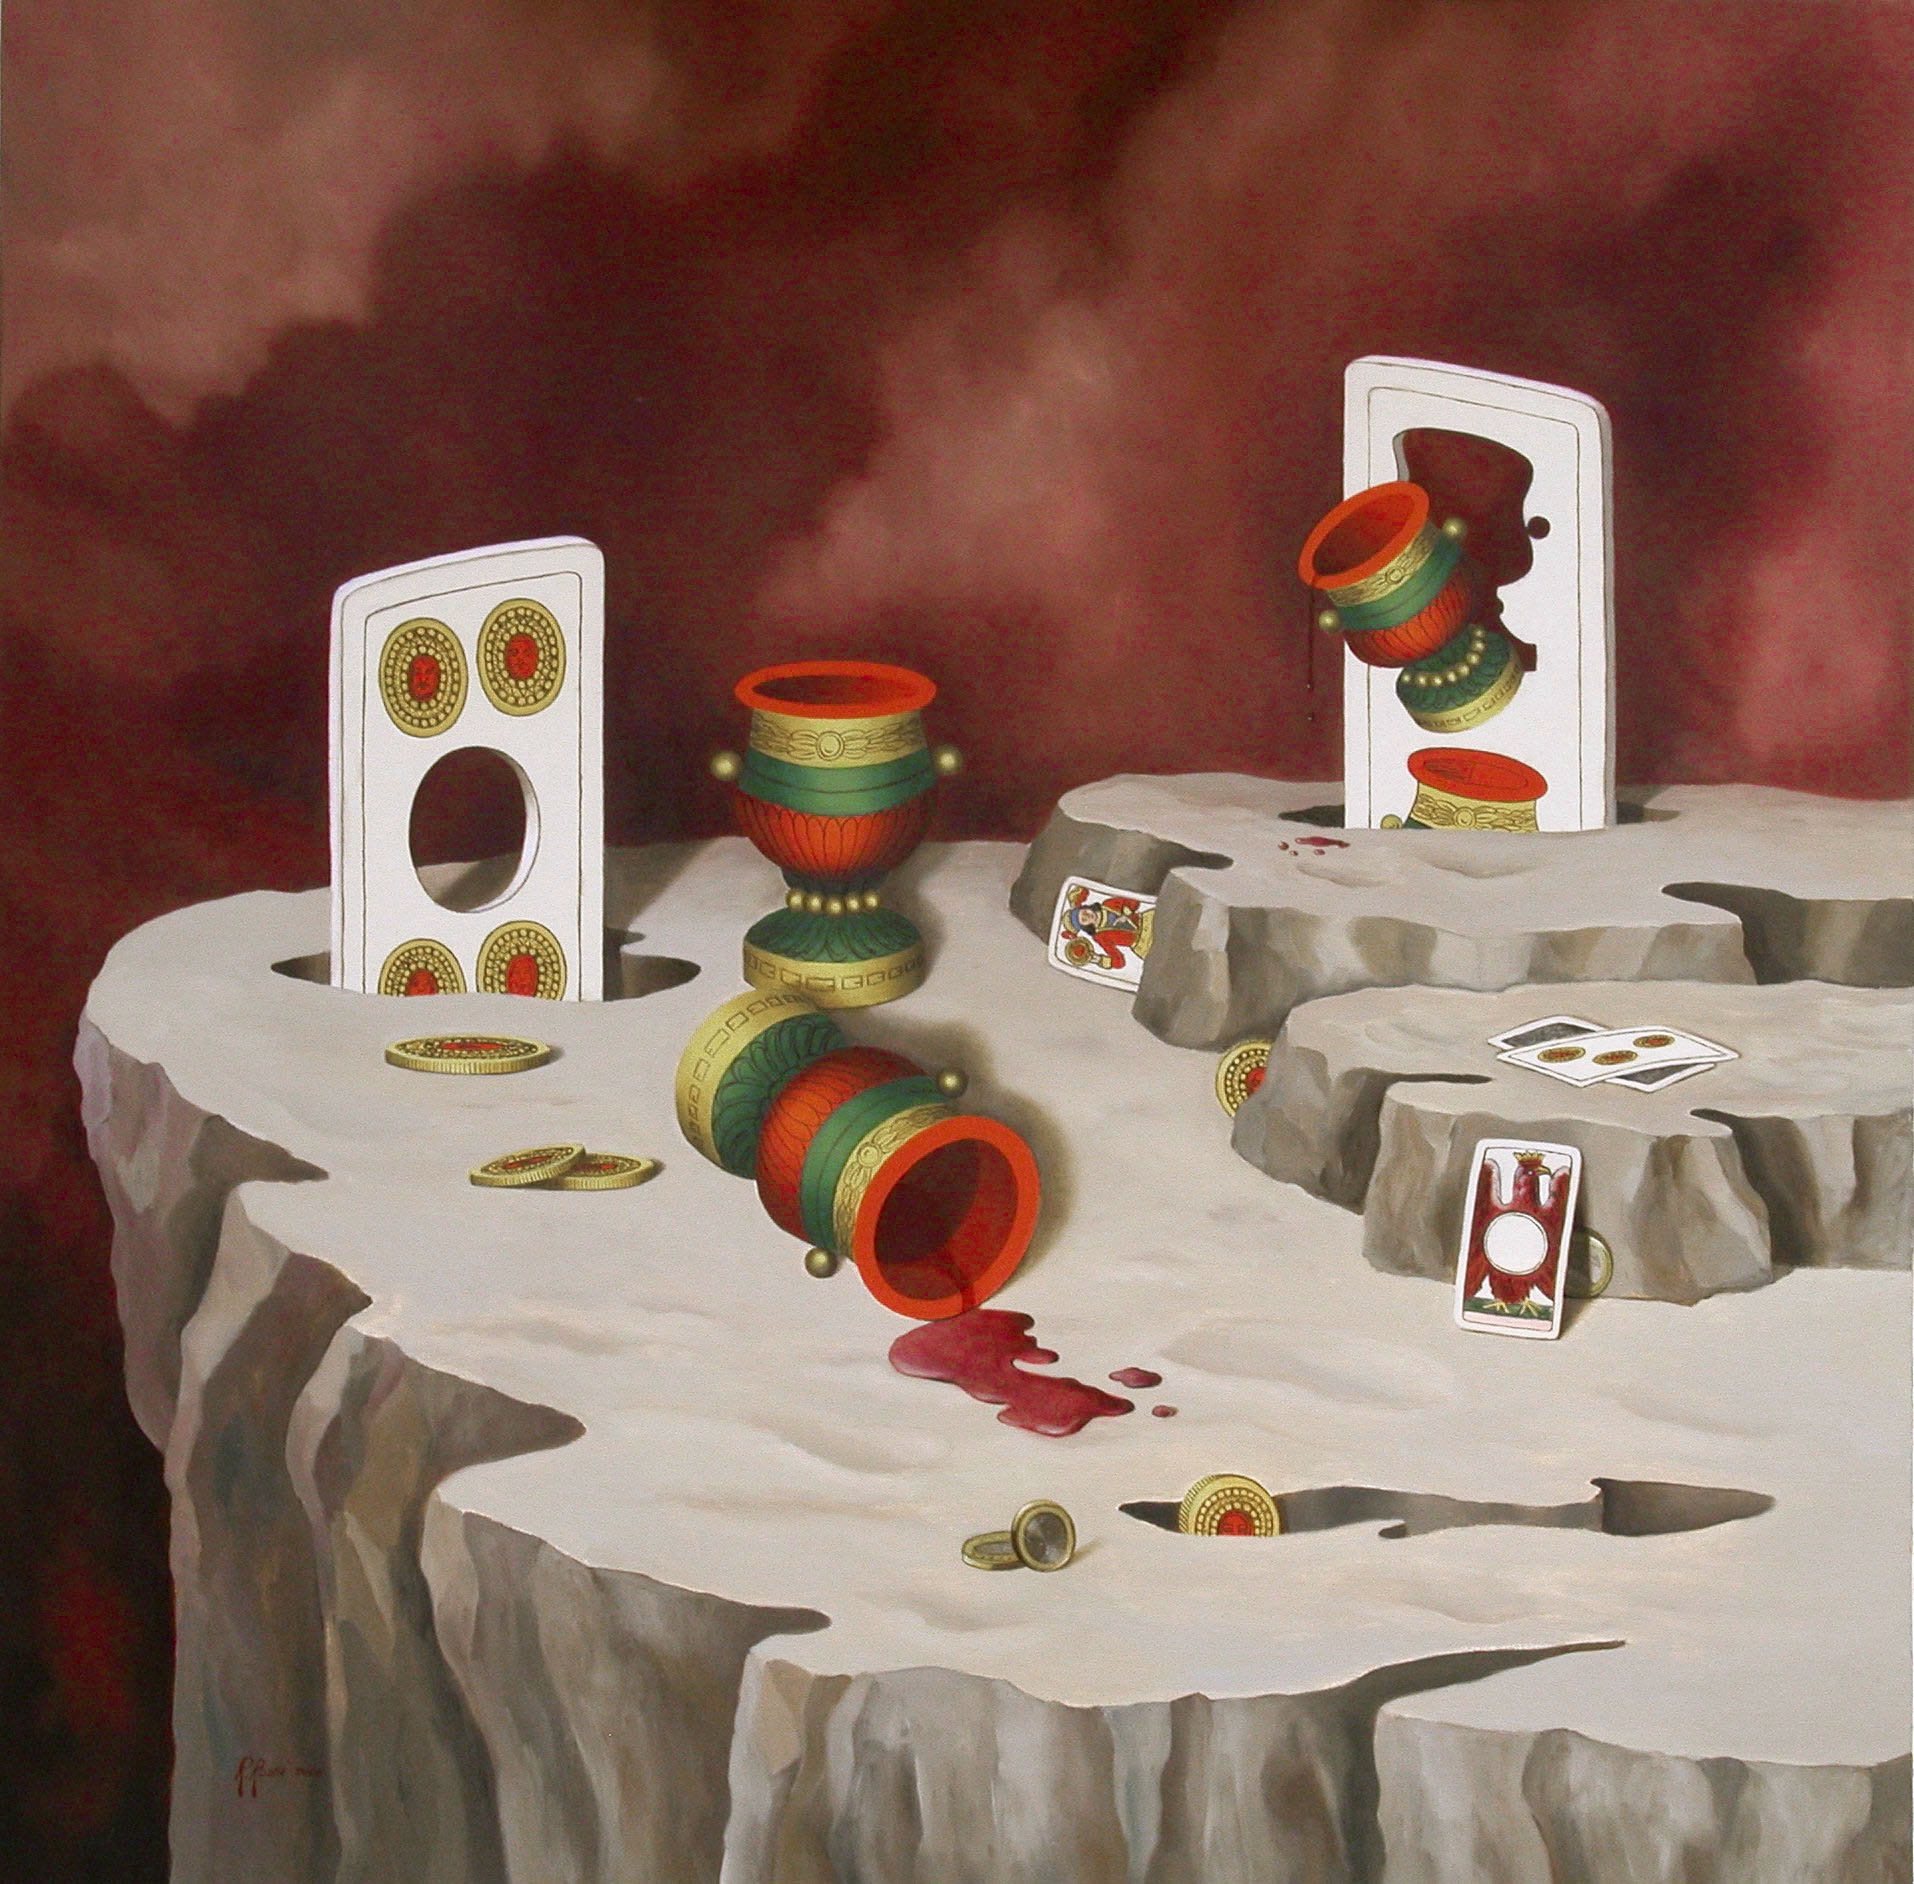 2008 roberta rossi - Gioco in metamorfosi - olio su tela - 70x70